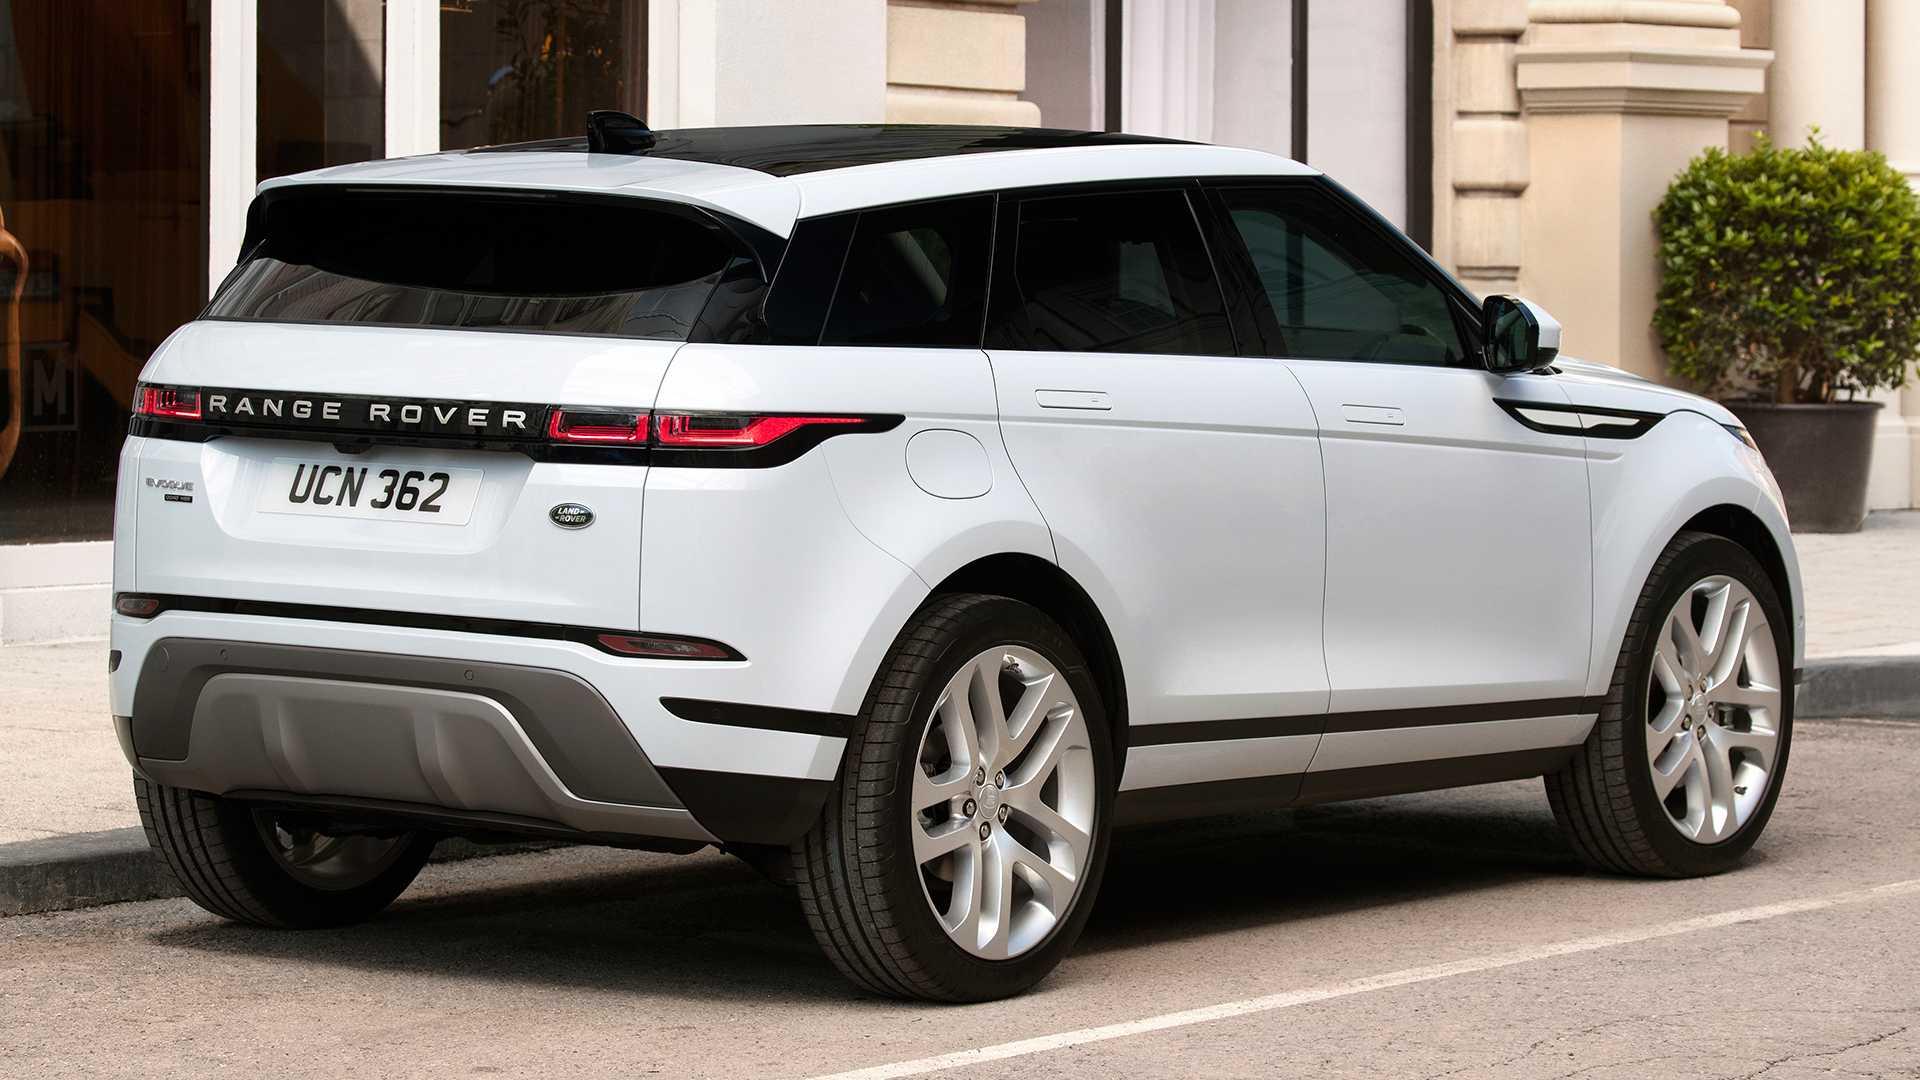 2020-range-rover-evoque (68)